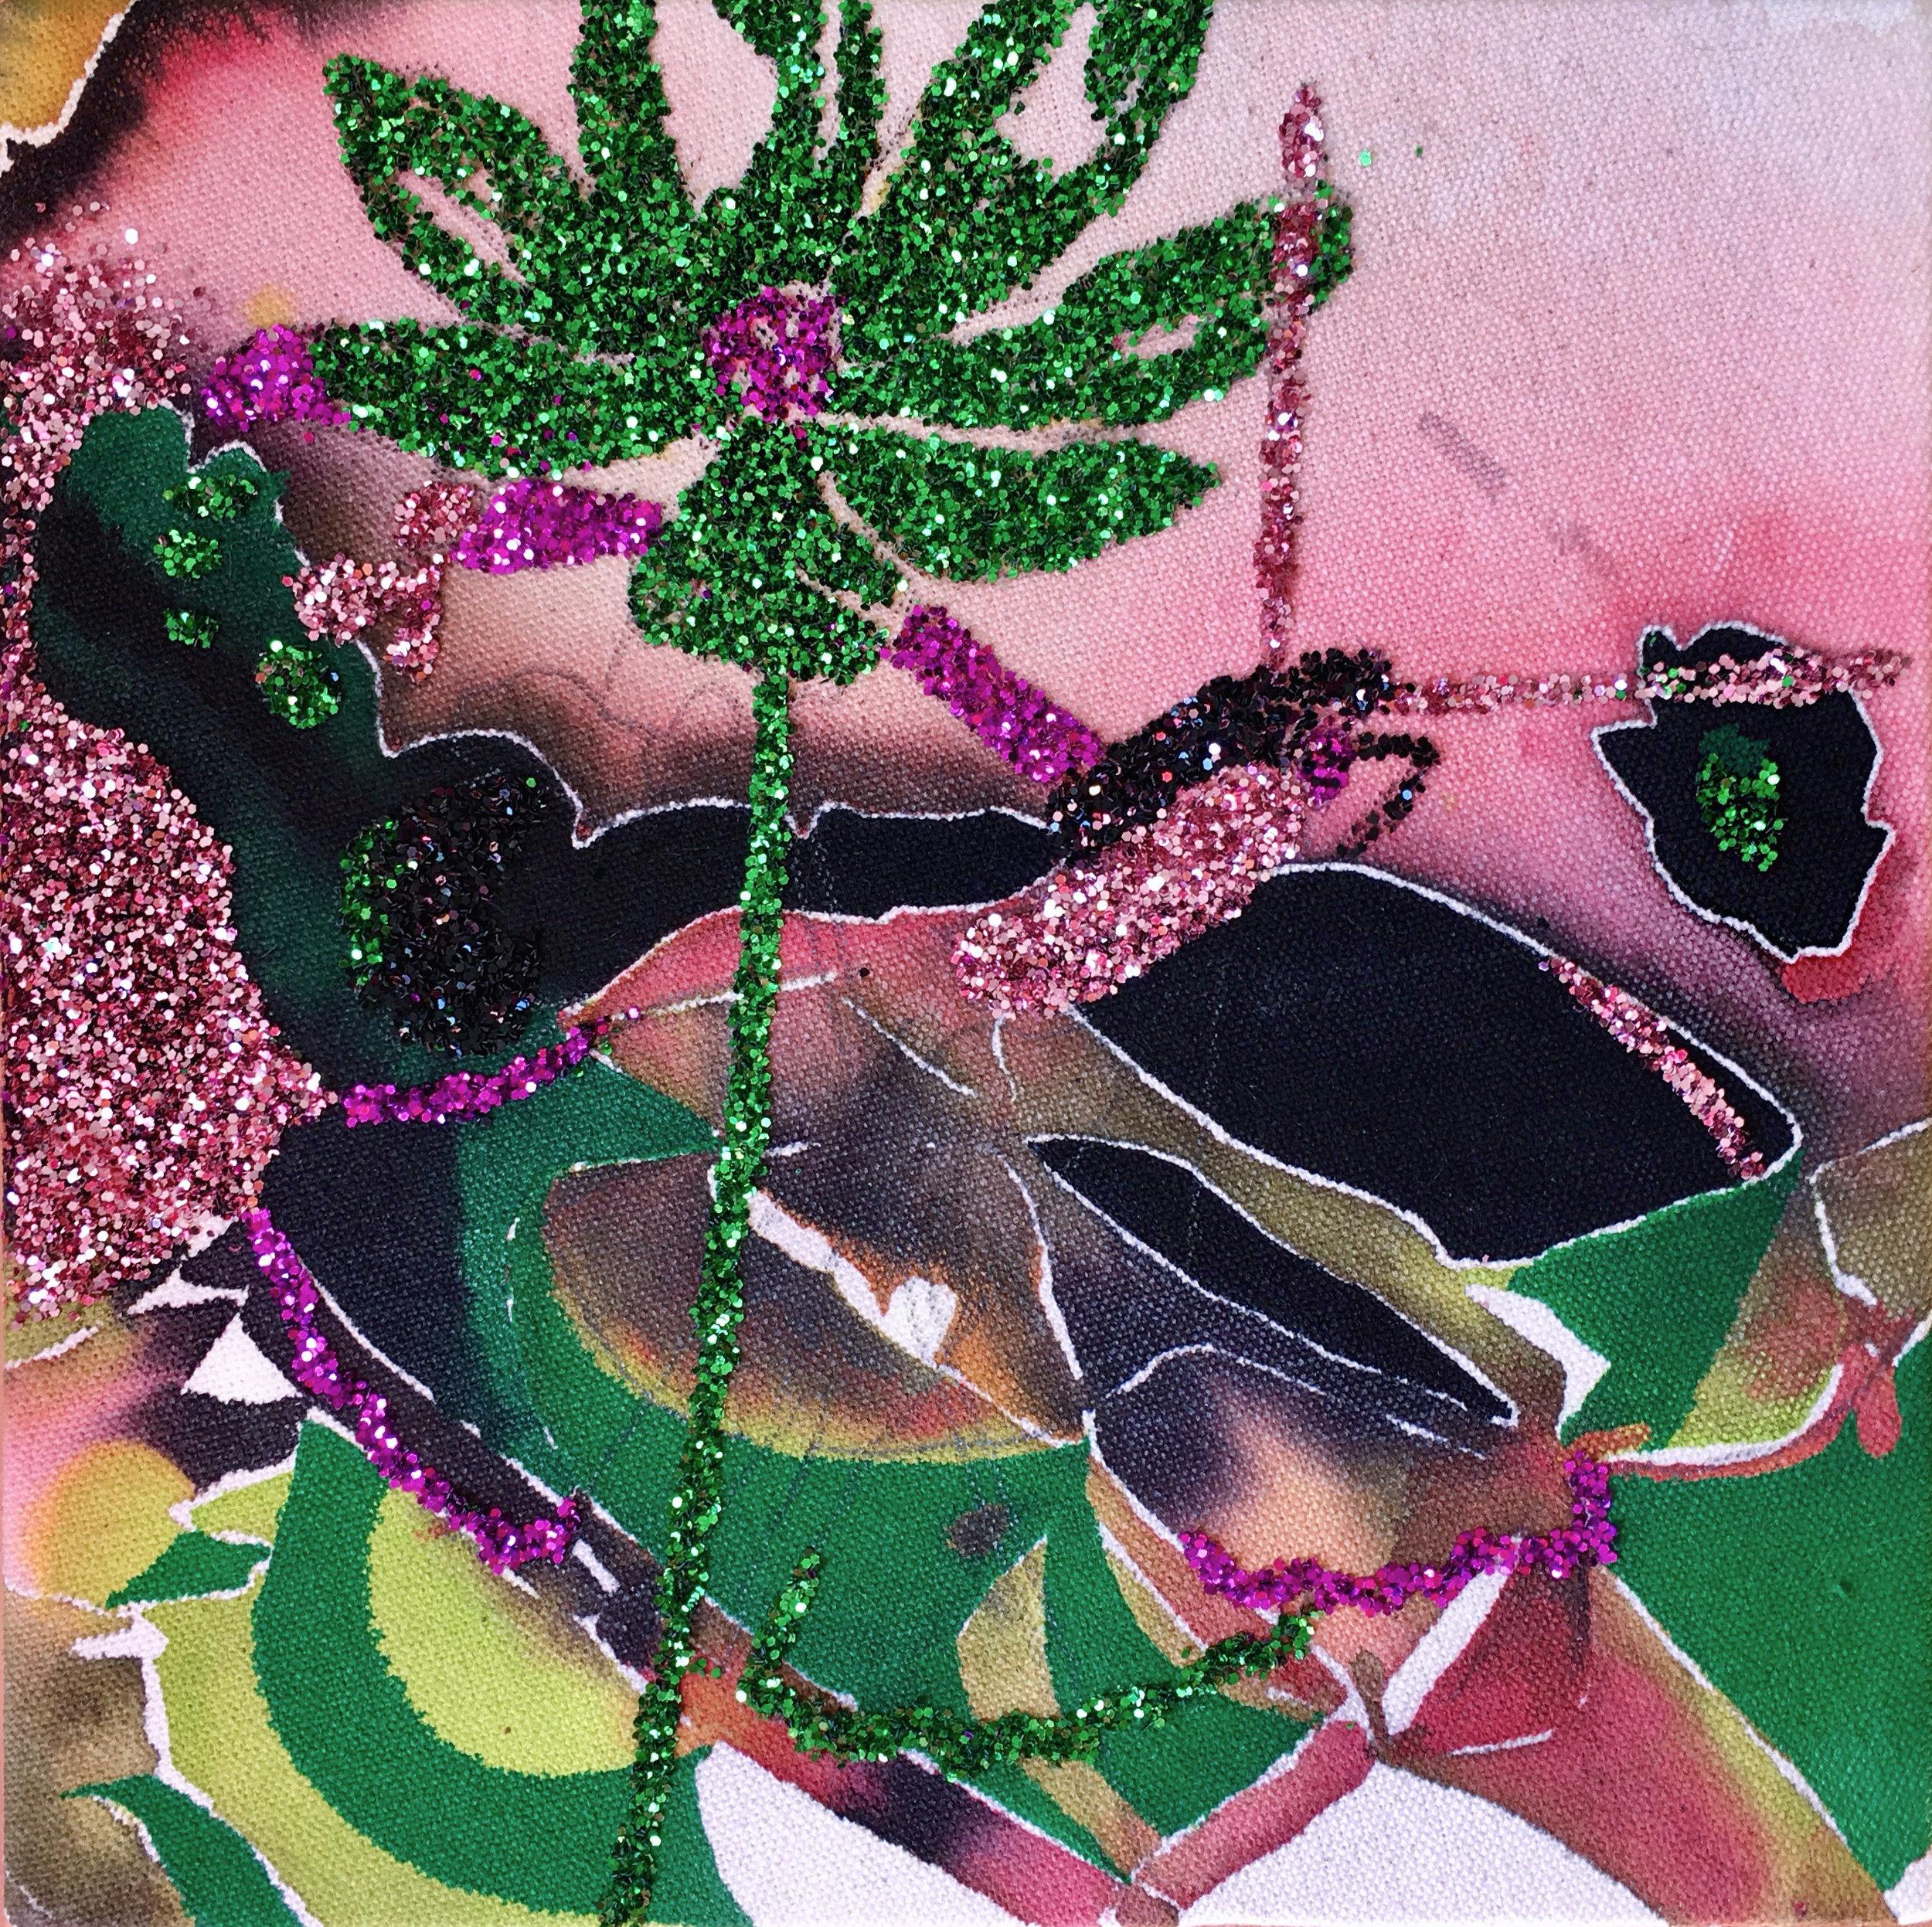 Untitled,  2019, fluid acrylic and glitter on canvas